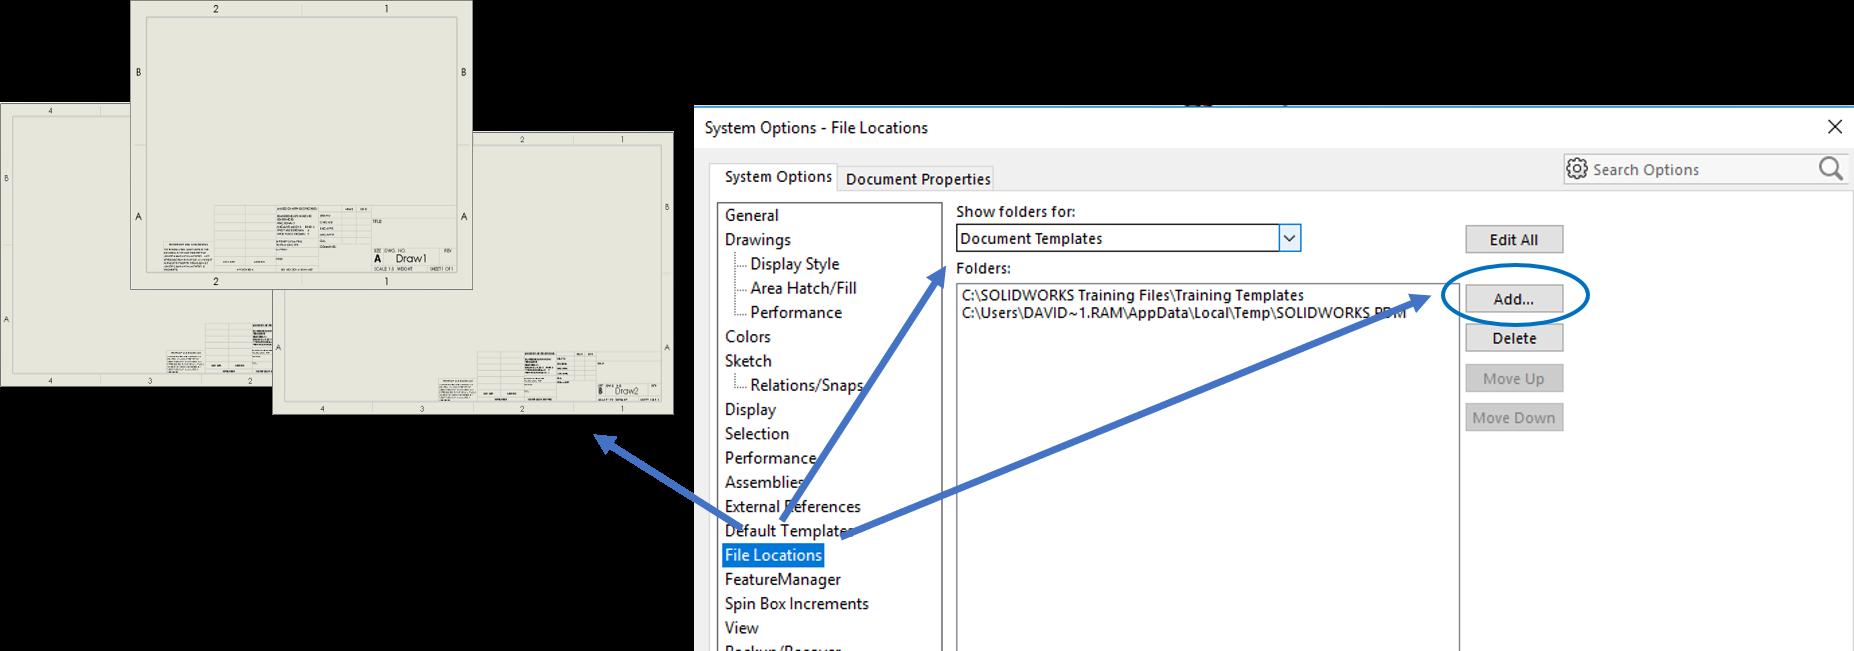 Custom File Locations